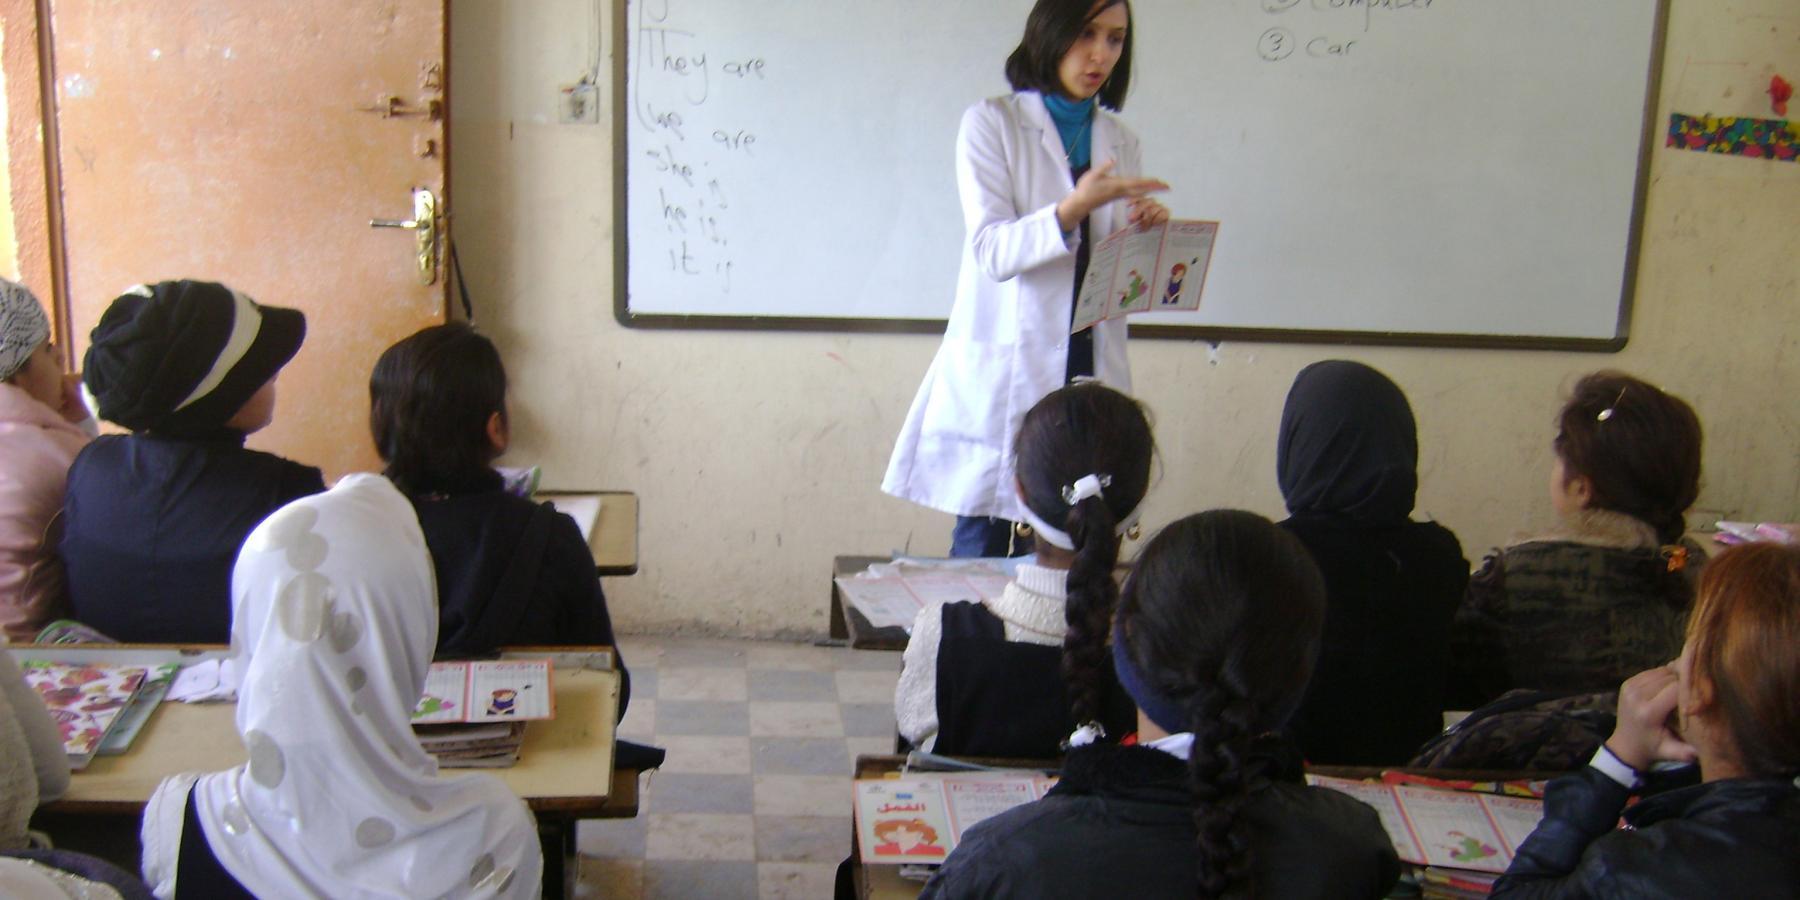 Dr. Sarah Al-Obaydi leads a health education session at a school in rural Iraq.